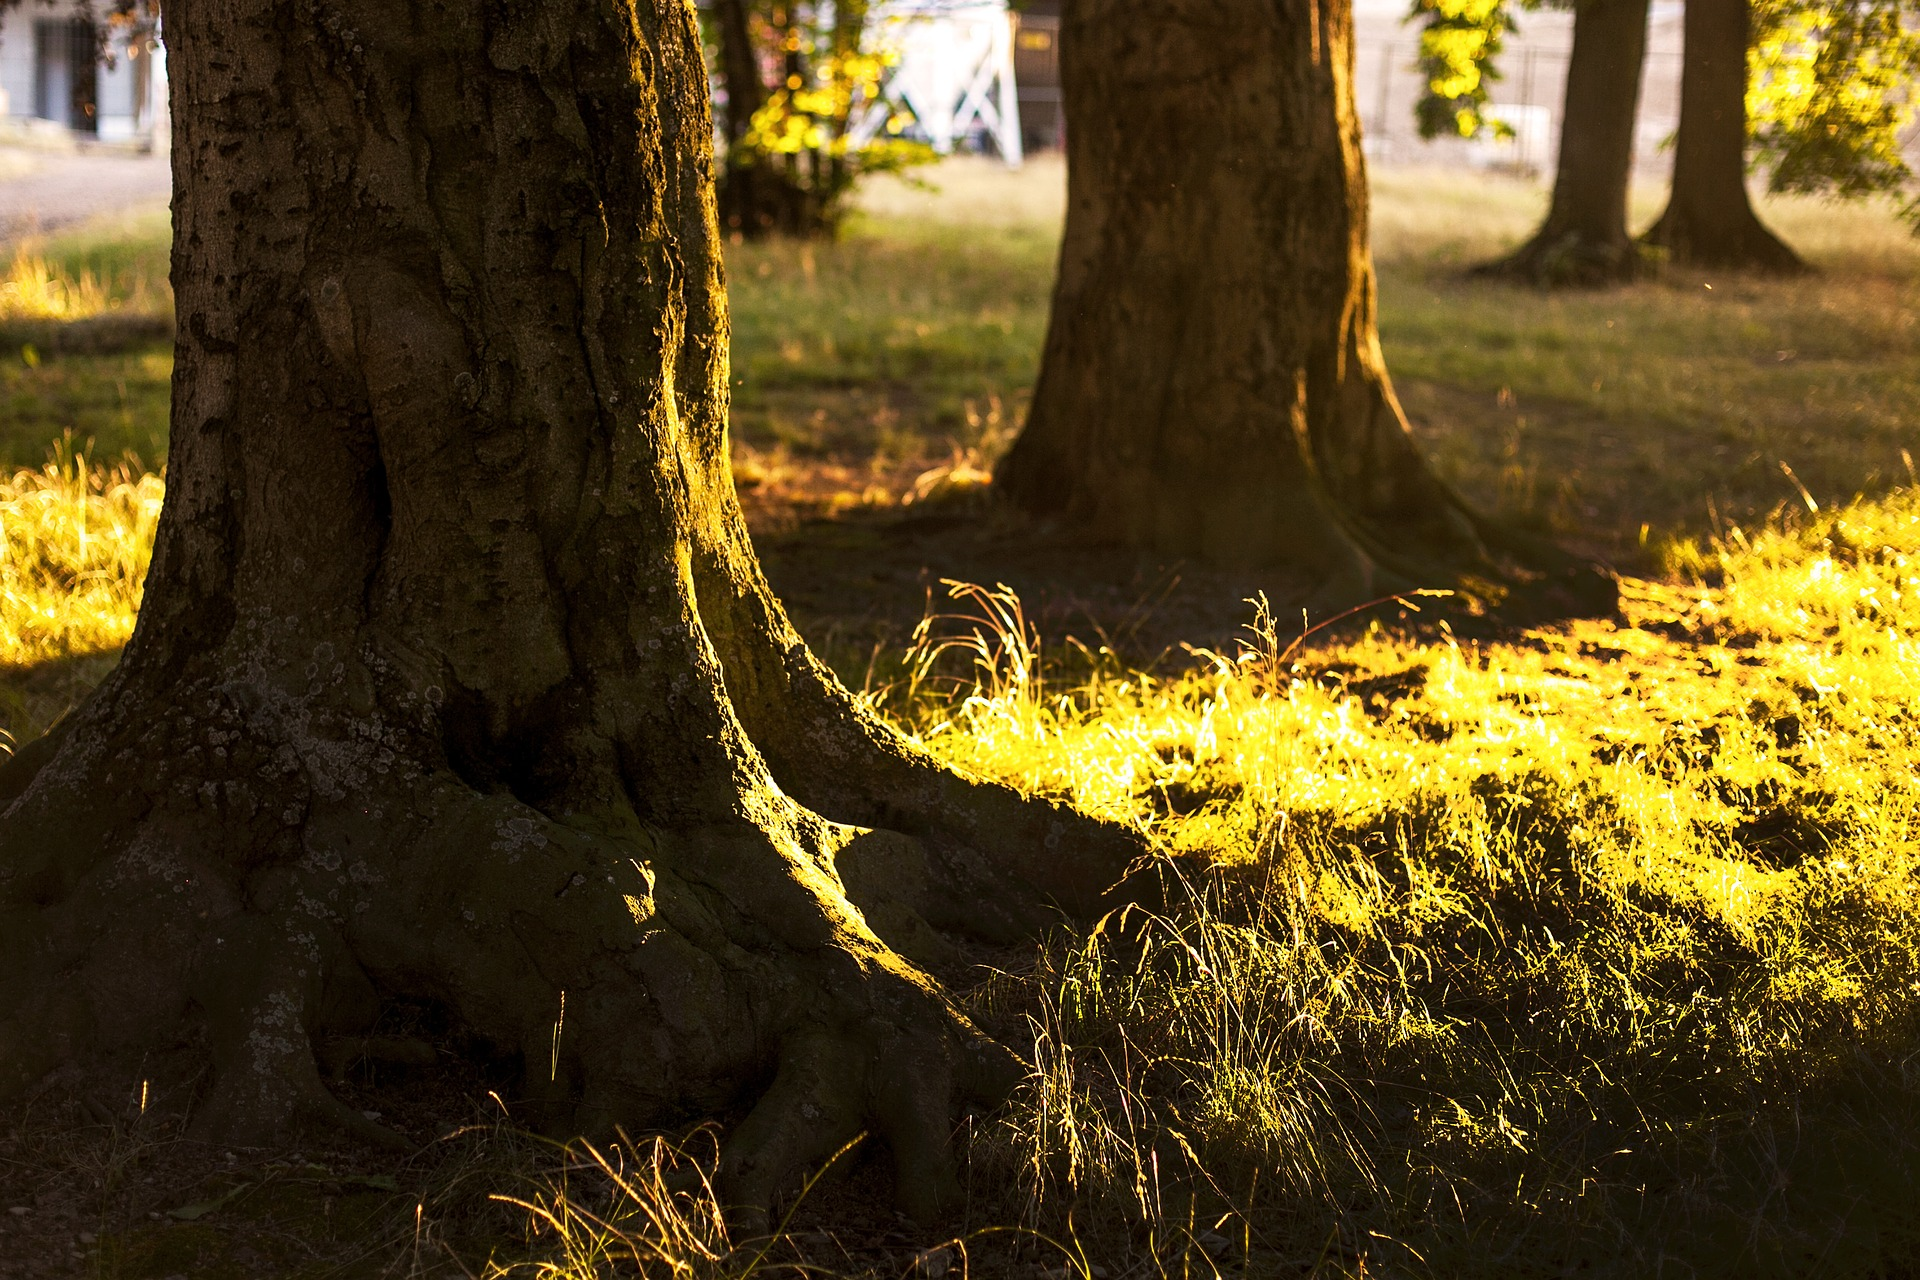 tree-1685603_1920